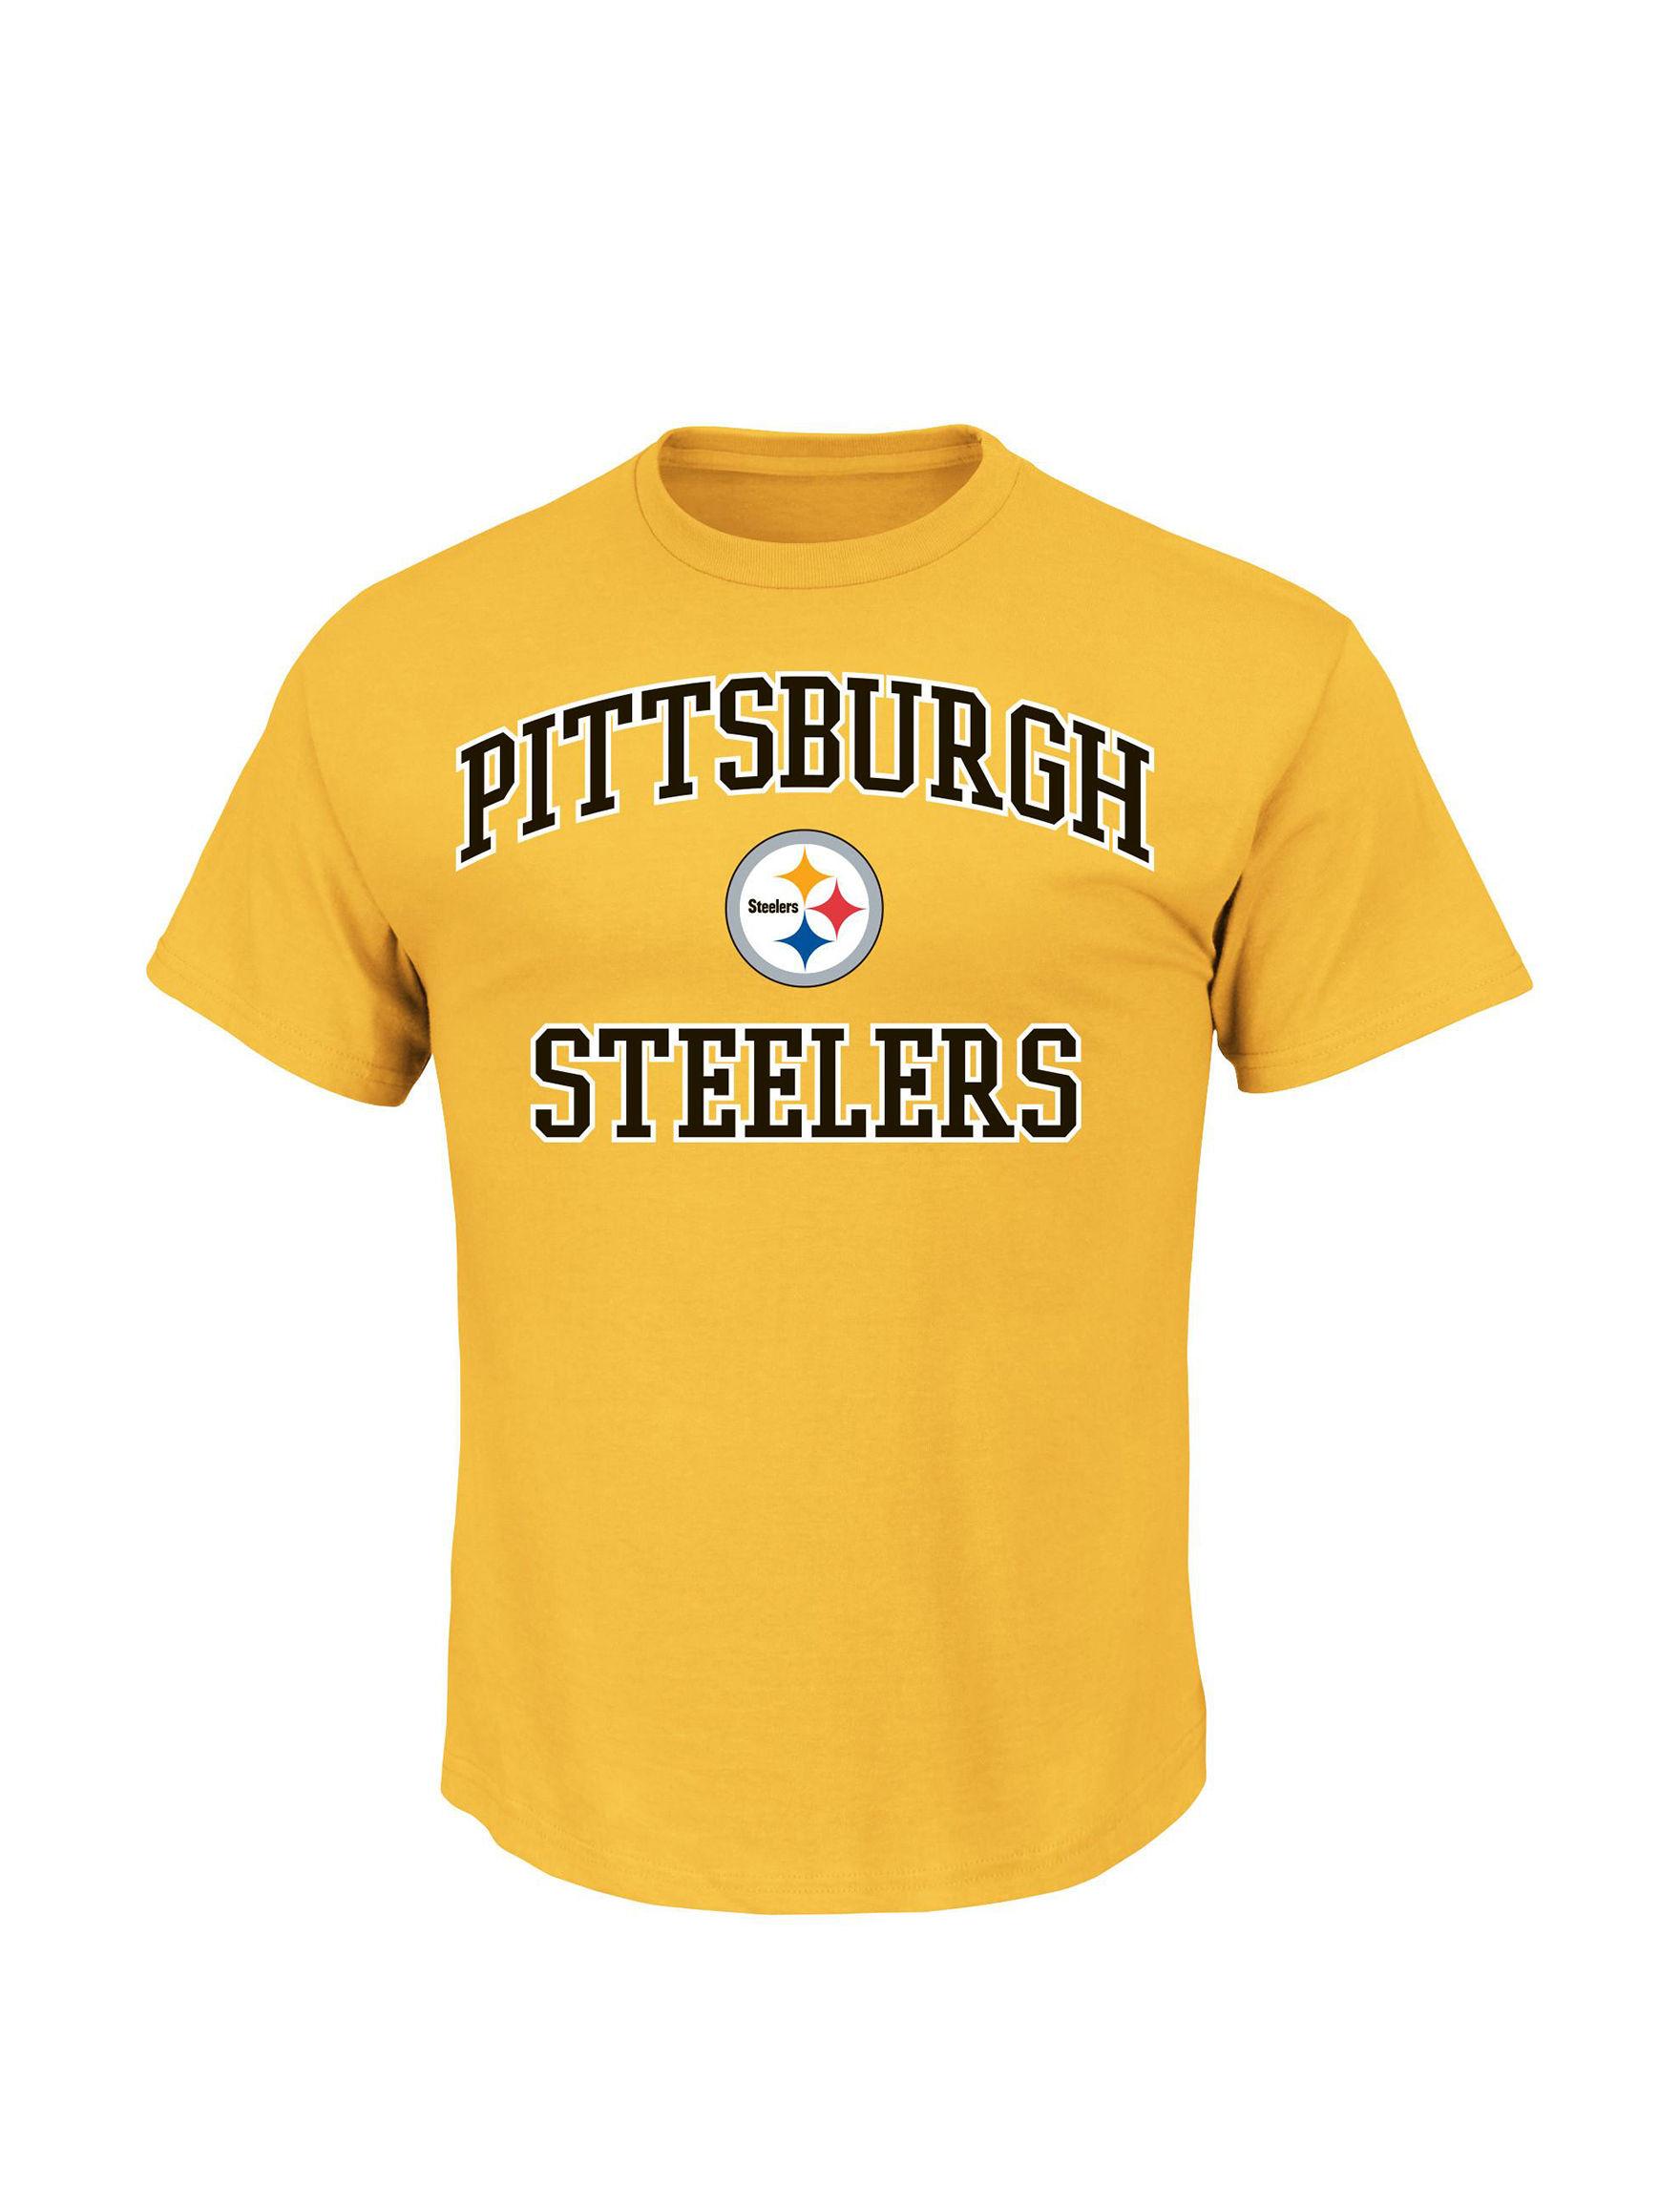 NFL Yellow NFL